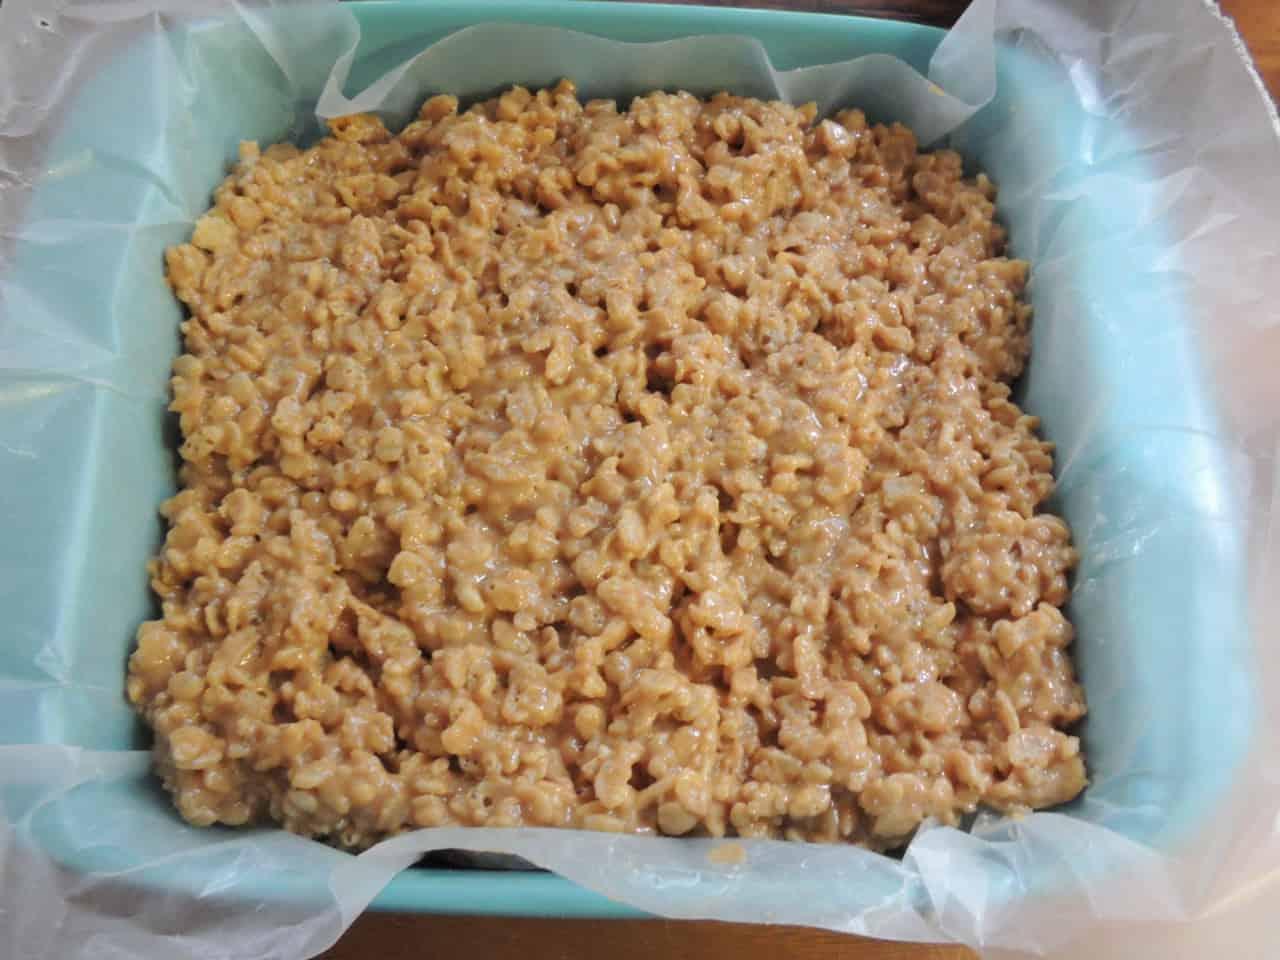 Fudgey Peanut Butter Rice Crispy Bars | Southern Plate